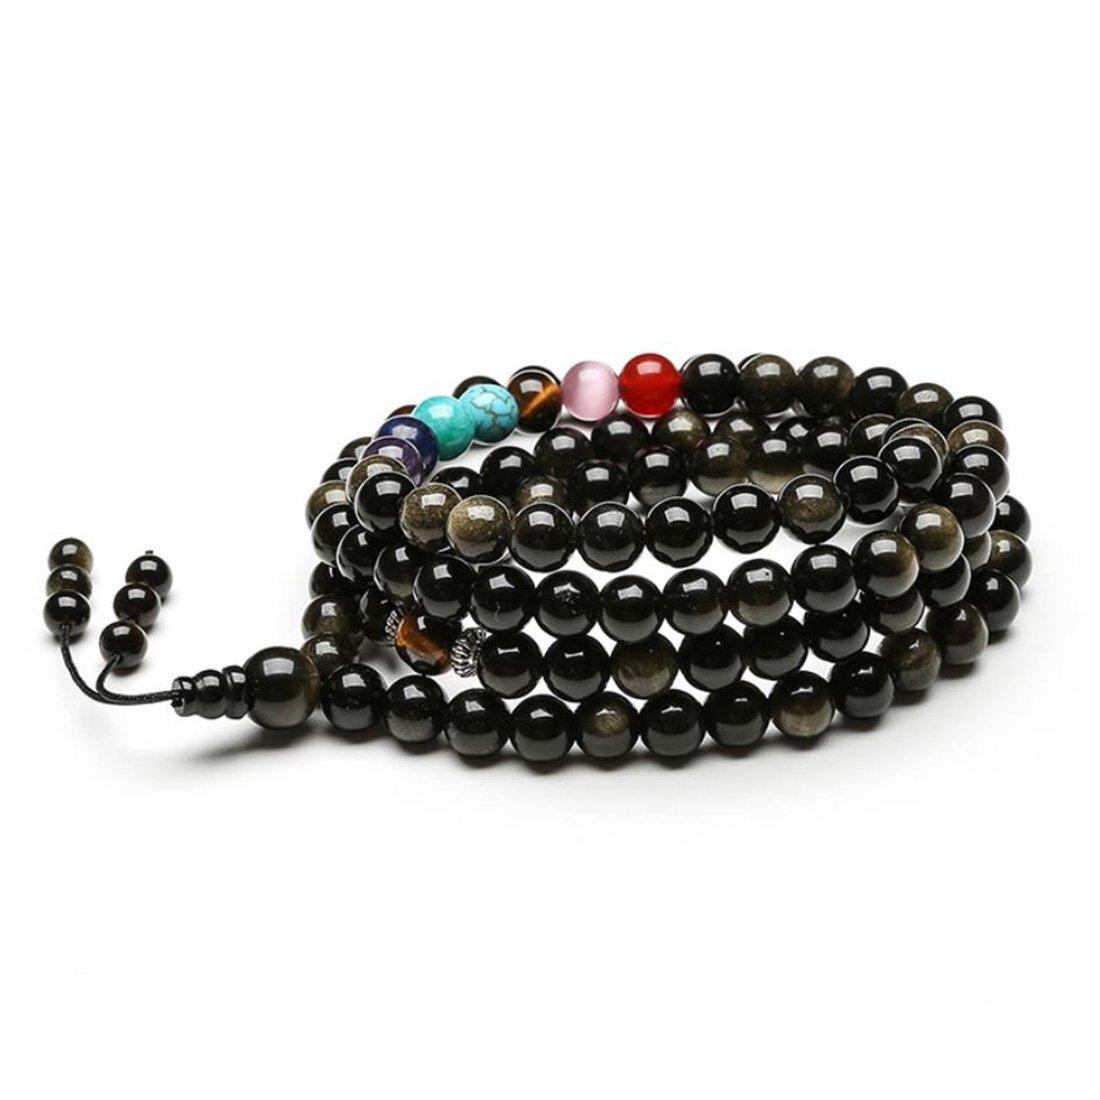 Efantina 6mm Natural 108 Mala Beads Matte Onyx 7 Chakra Bracelet Necklace for Men Women YiFan Jewelry